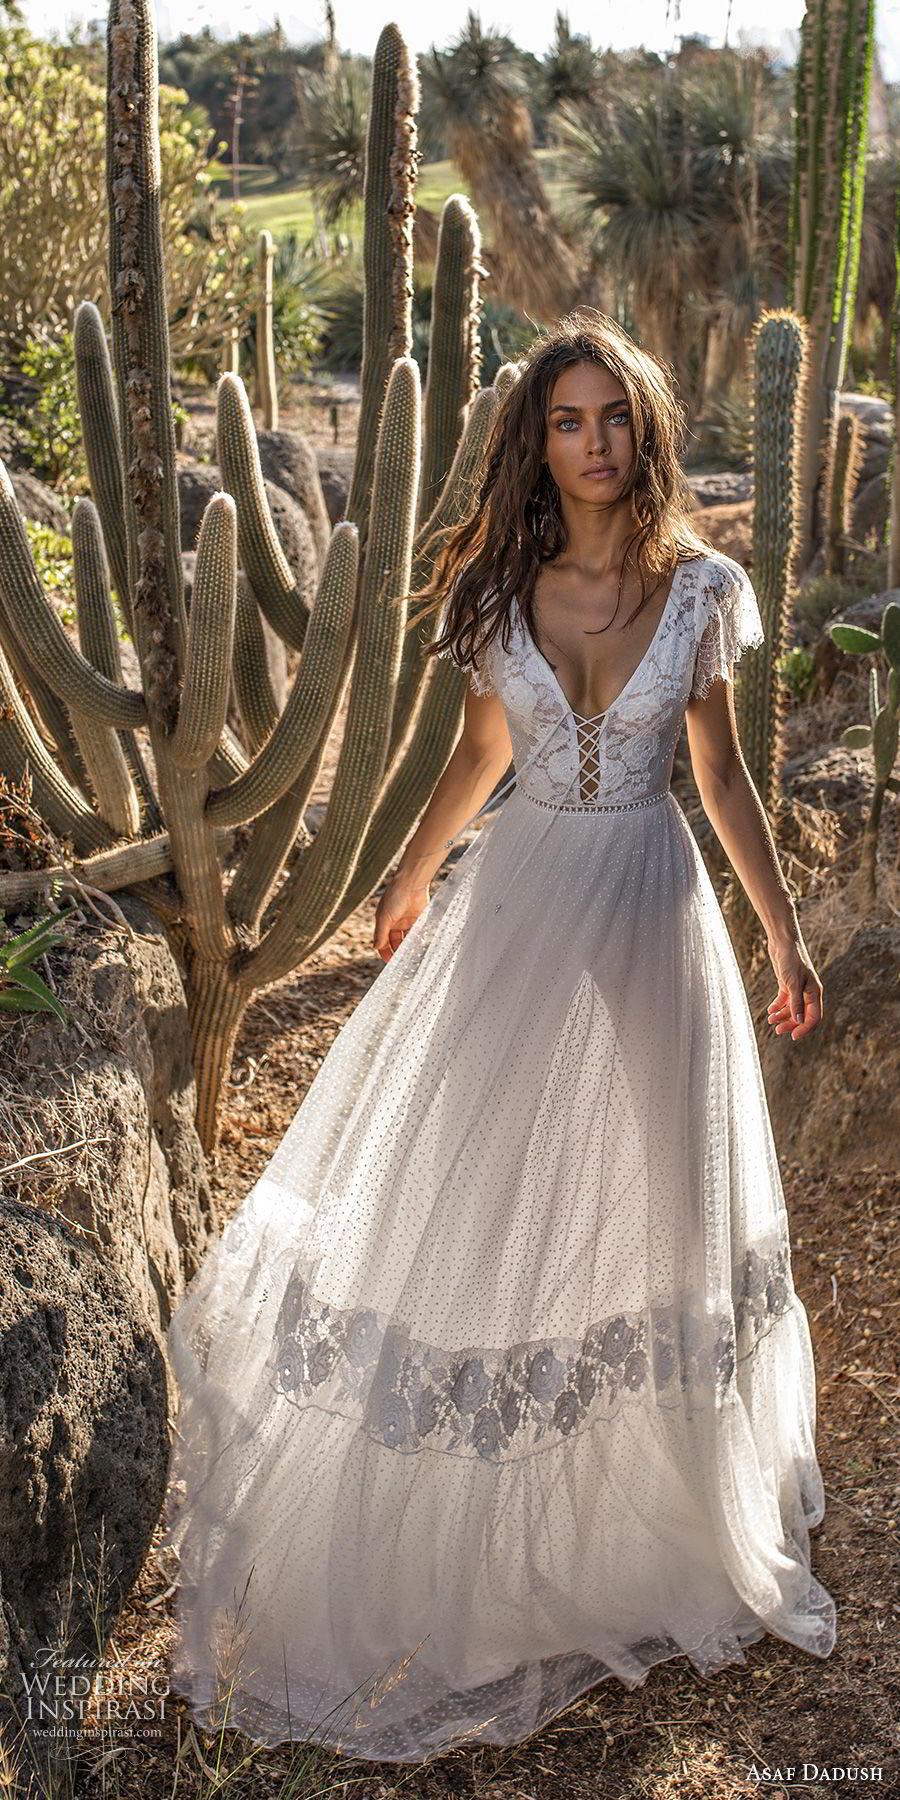 asaf dadush 2018 bridal short butterfly sleeves deep v neck heavily embellished bodice bohemian a  line wedding dress low open back sweep train (7) mv